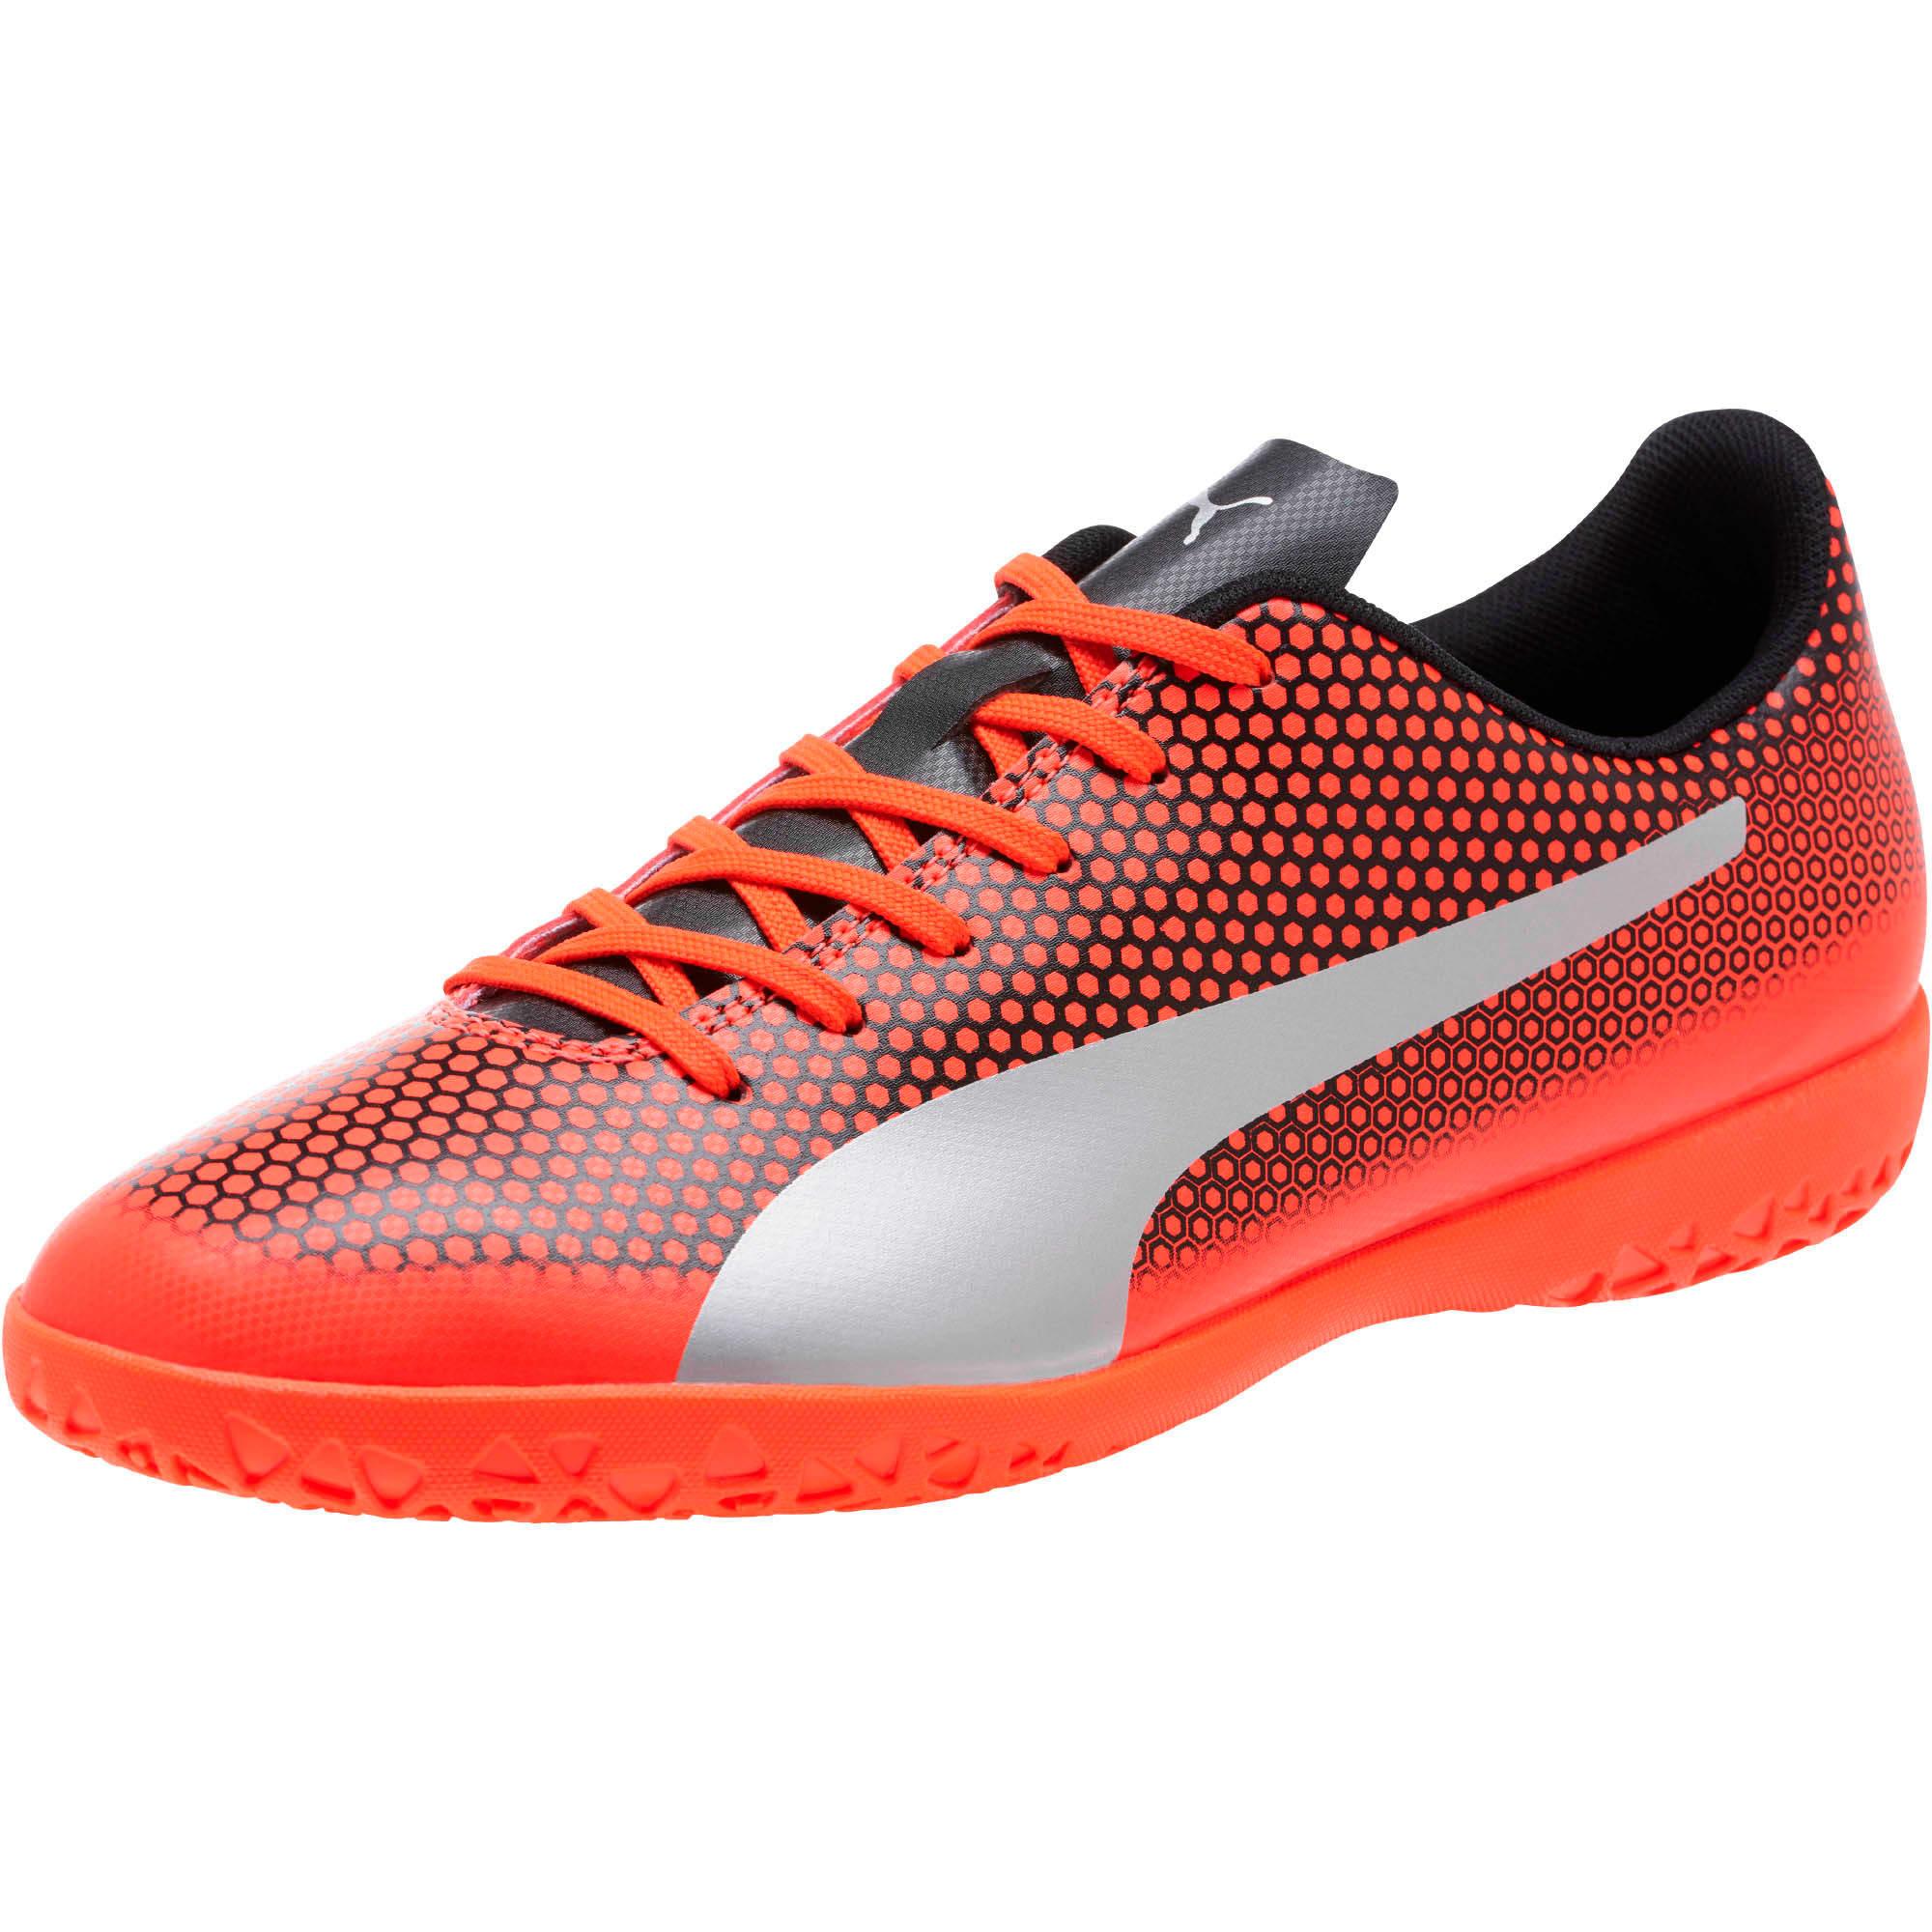 Thumbnail 1 of PUMA Spirit IT Men's Soccer Shoes, Red-Silver-Black, medium